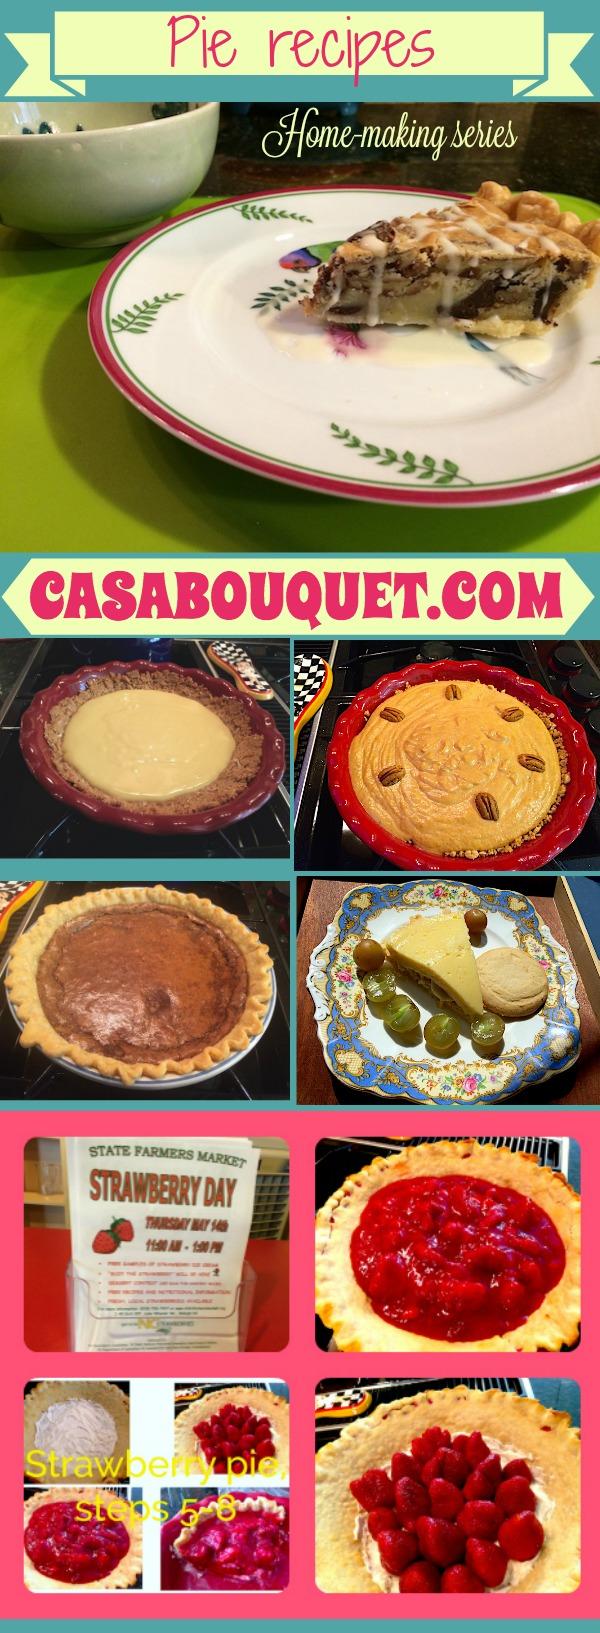 Casa Bouquet pie recipes series. Pie recipes are a true pleasure of life. At Casa Bouquet, pies are a preferred dessert.